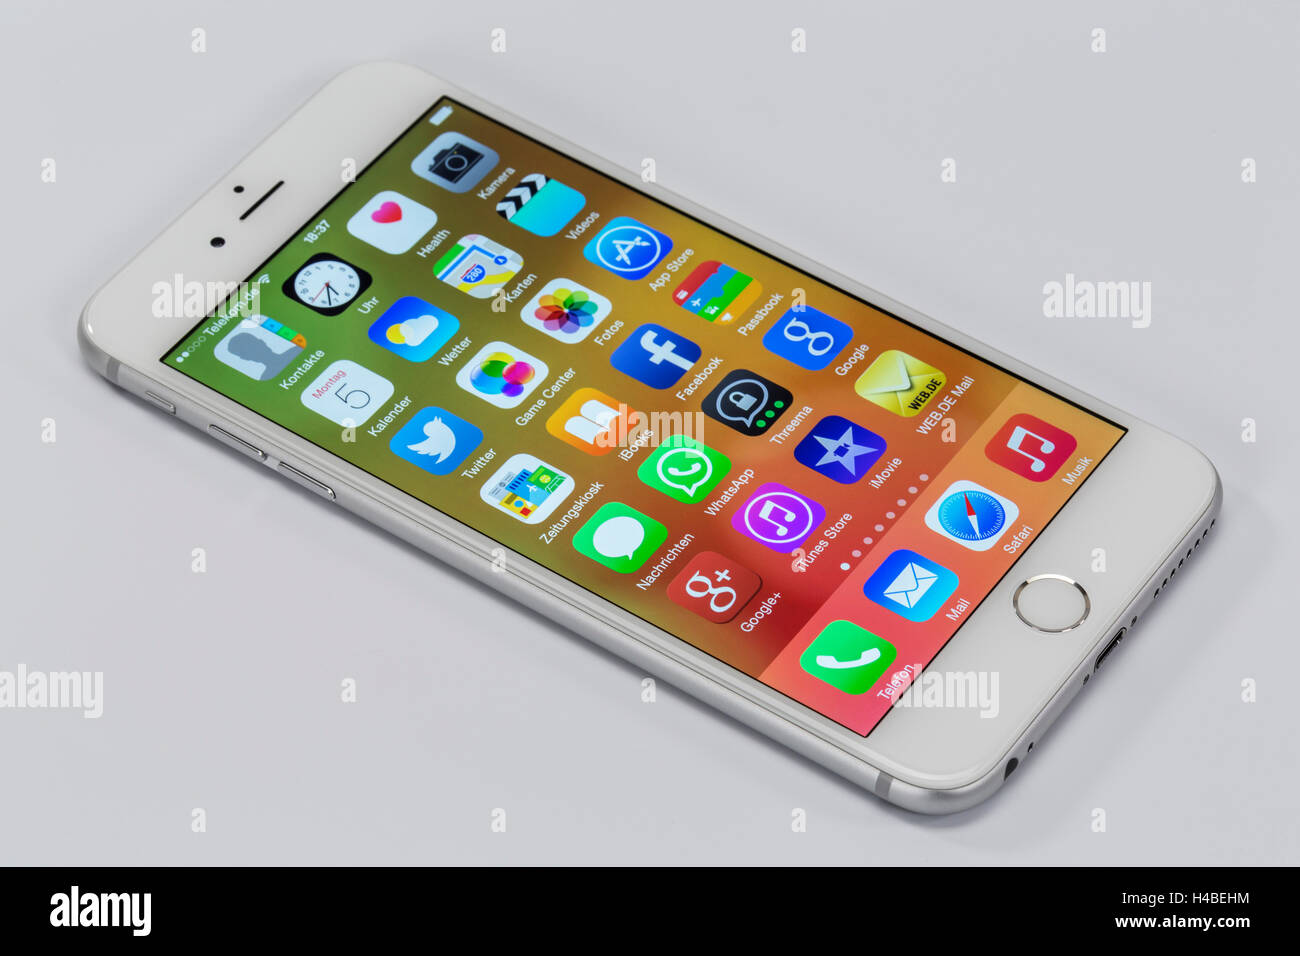 Apple iPhone 6 plus, pantalla, aplicaciones, programas multi-función táctil, Imagen De Stock